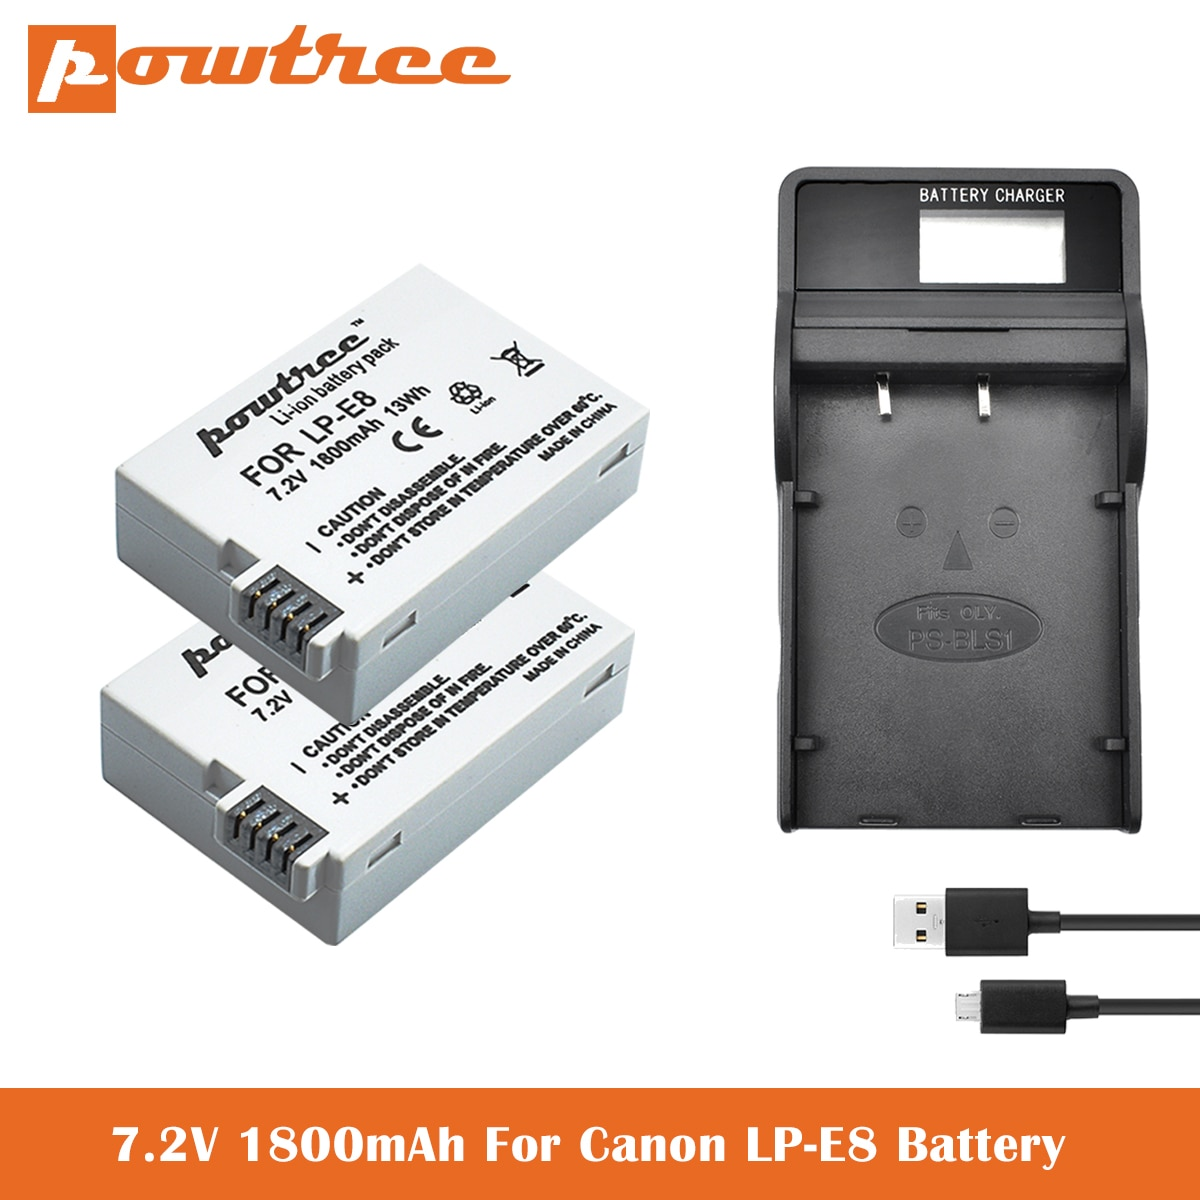 AliExpress - LP-E8 Battery+Charger For Canon Rebel T5i T4i T3i T2i EOS 600D, 550D, 650D, 700D, Kiss X5, X4, Kiss X6 Replacement of LC-E8E L50